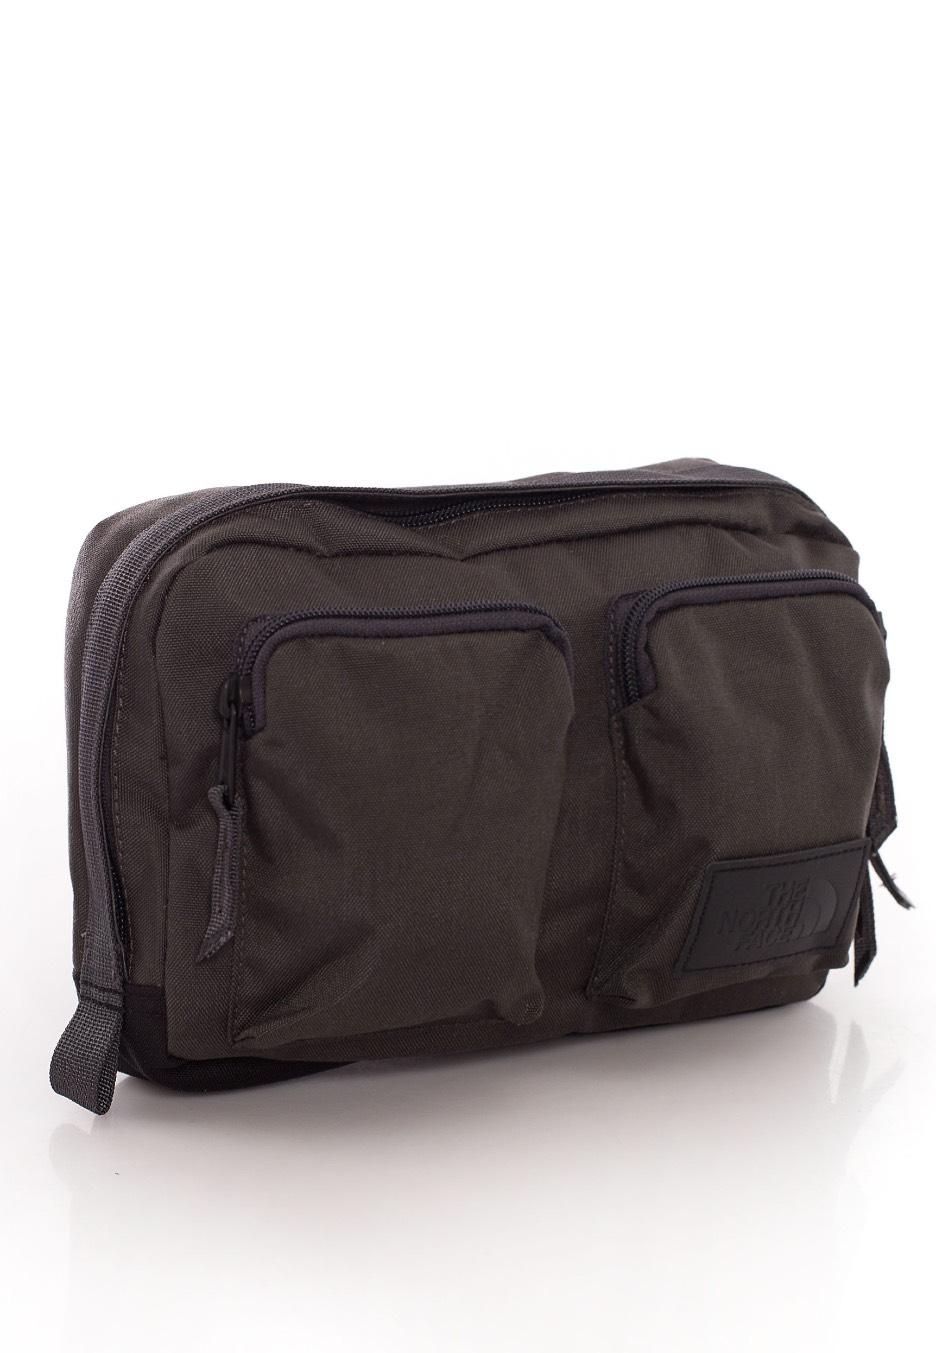 bag north face